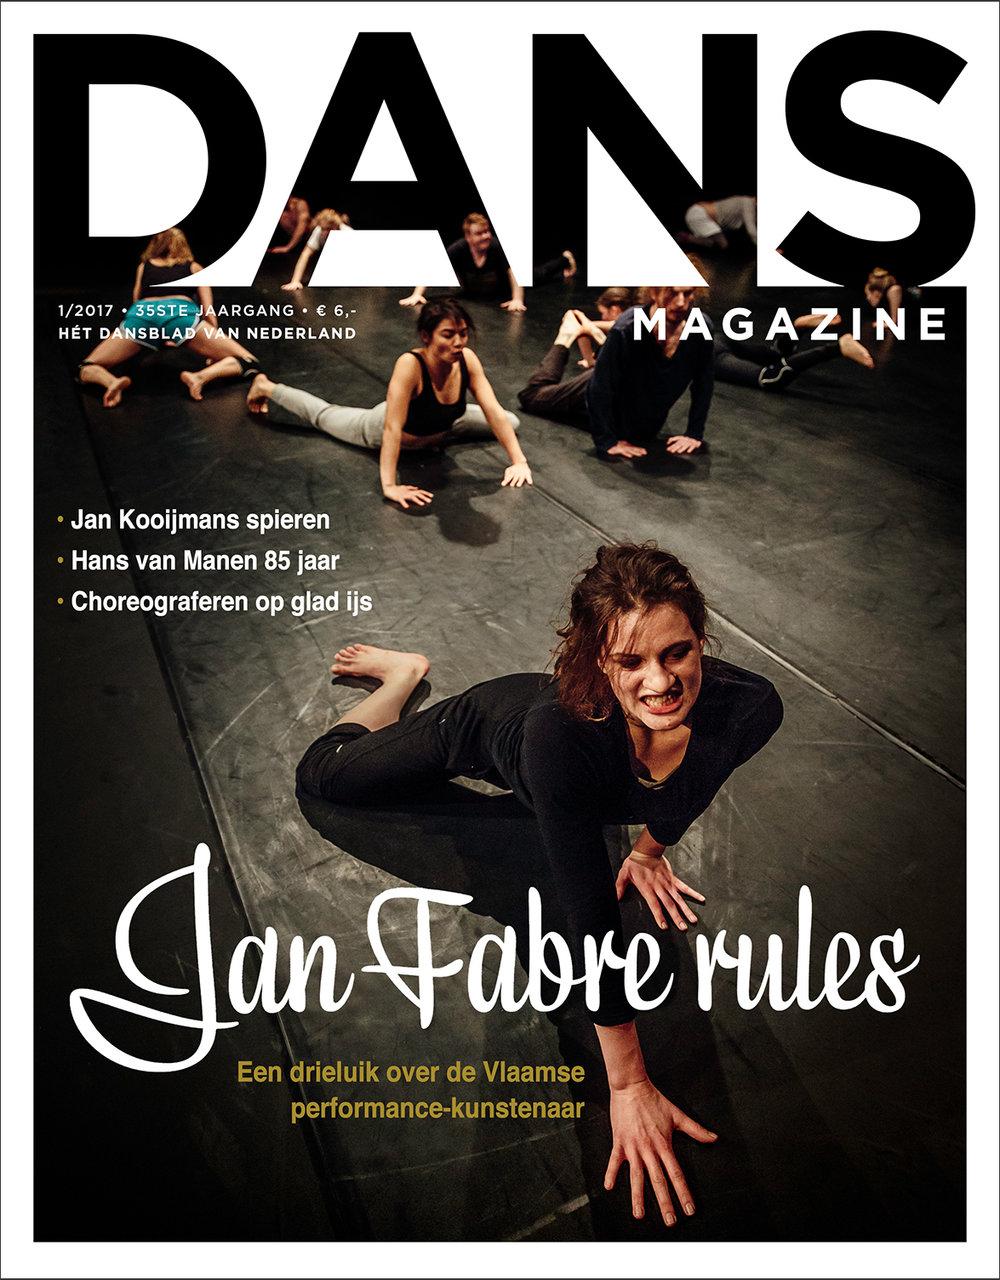 Troubleyn Jan Fabre |Masterclass   Belgium Rules/Belgian Rules   Magazine Cover   Dans Magazine, 2017